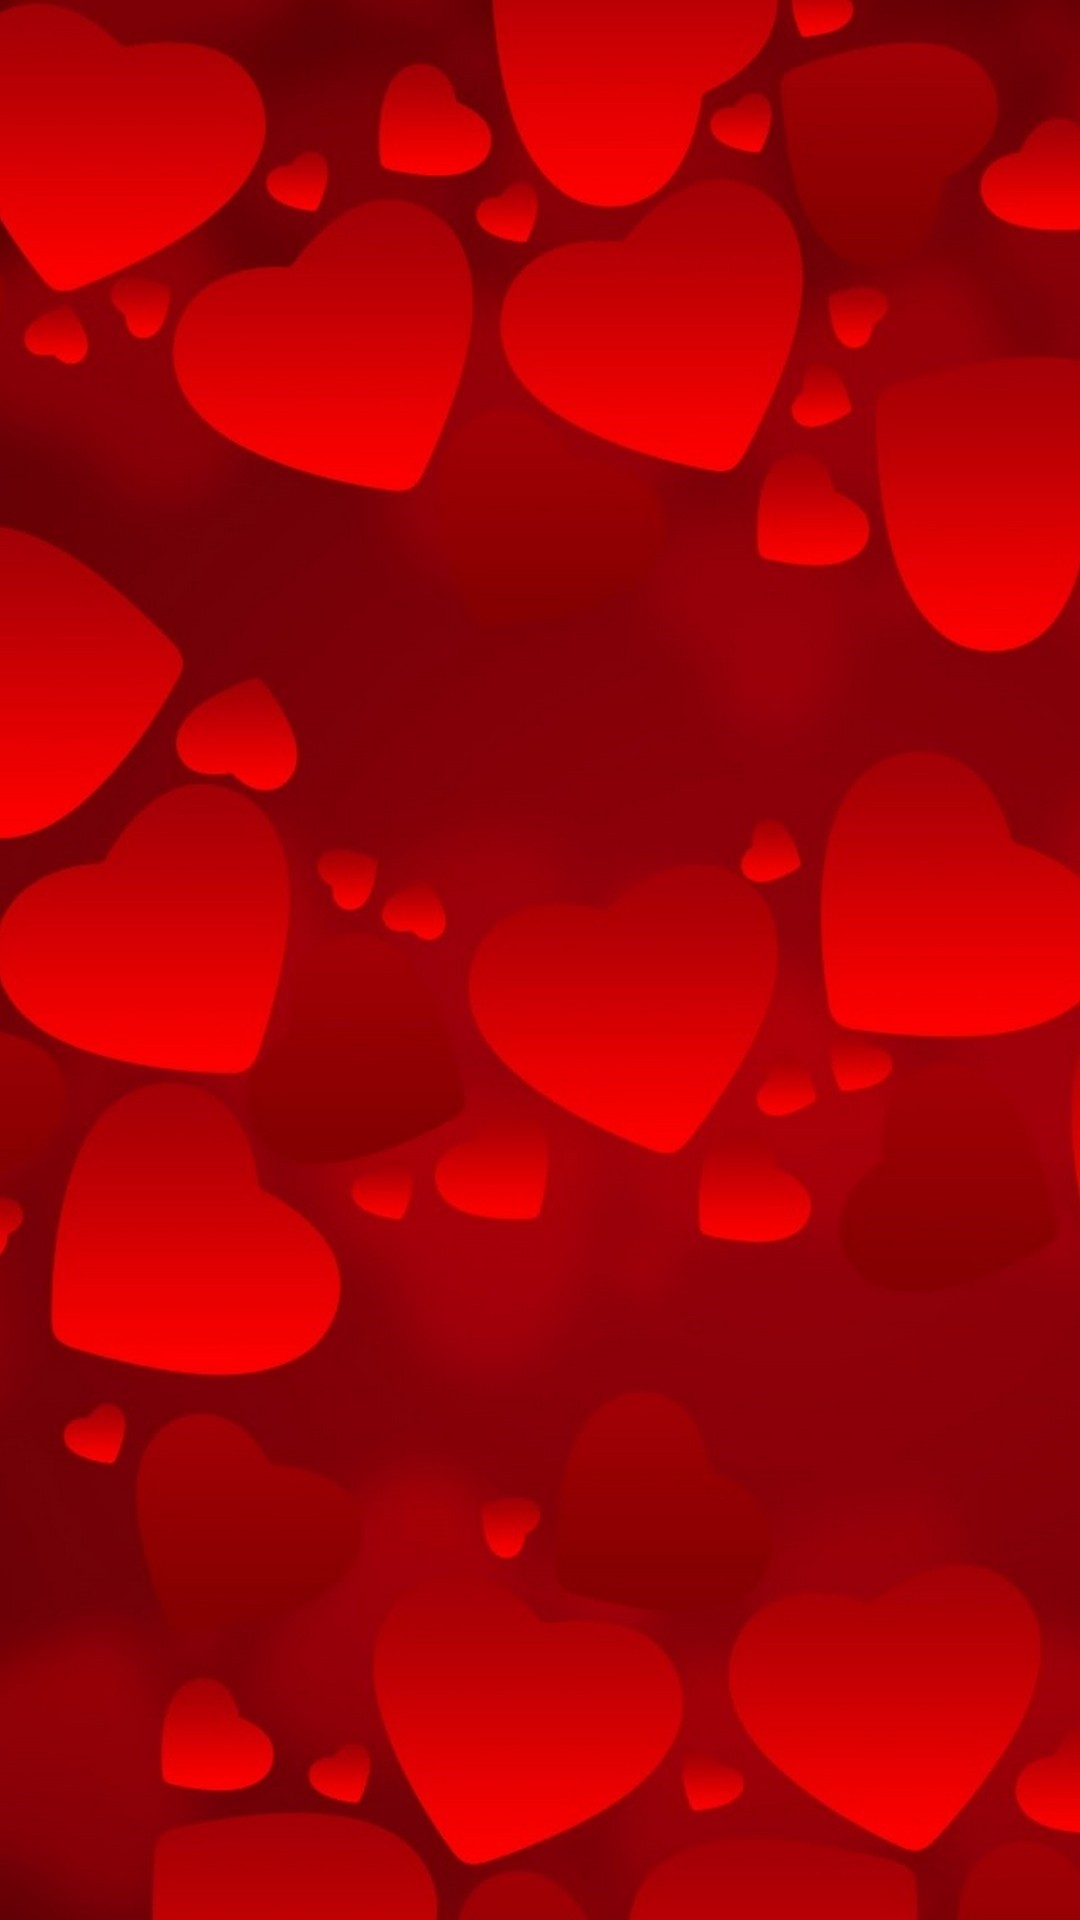 Valentines iphone 6s plus wallpaper